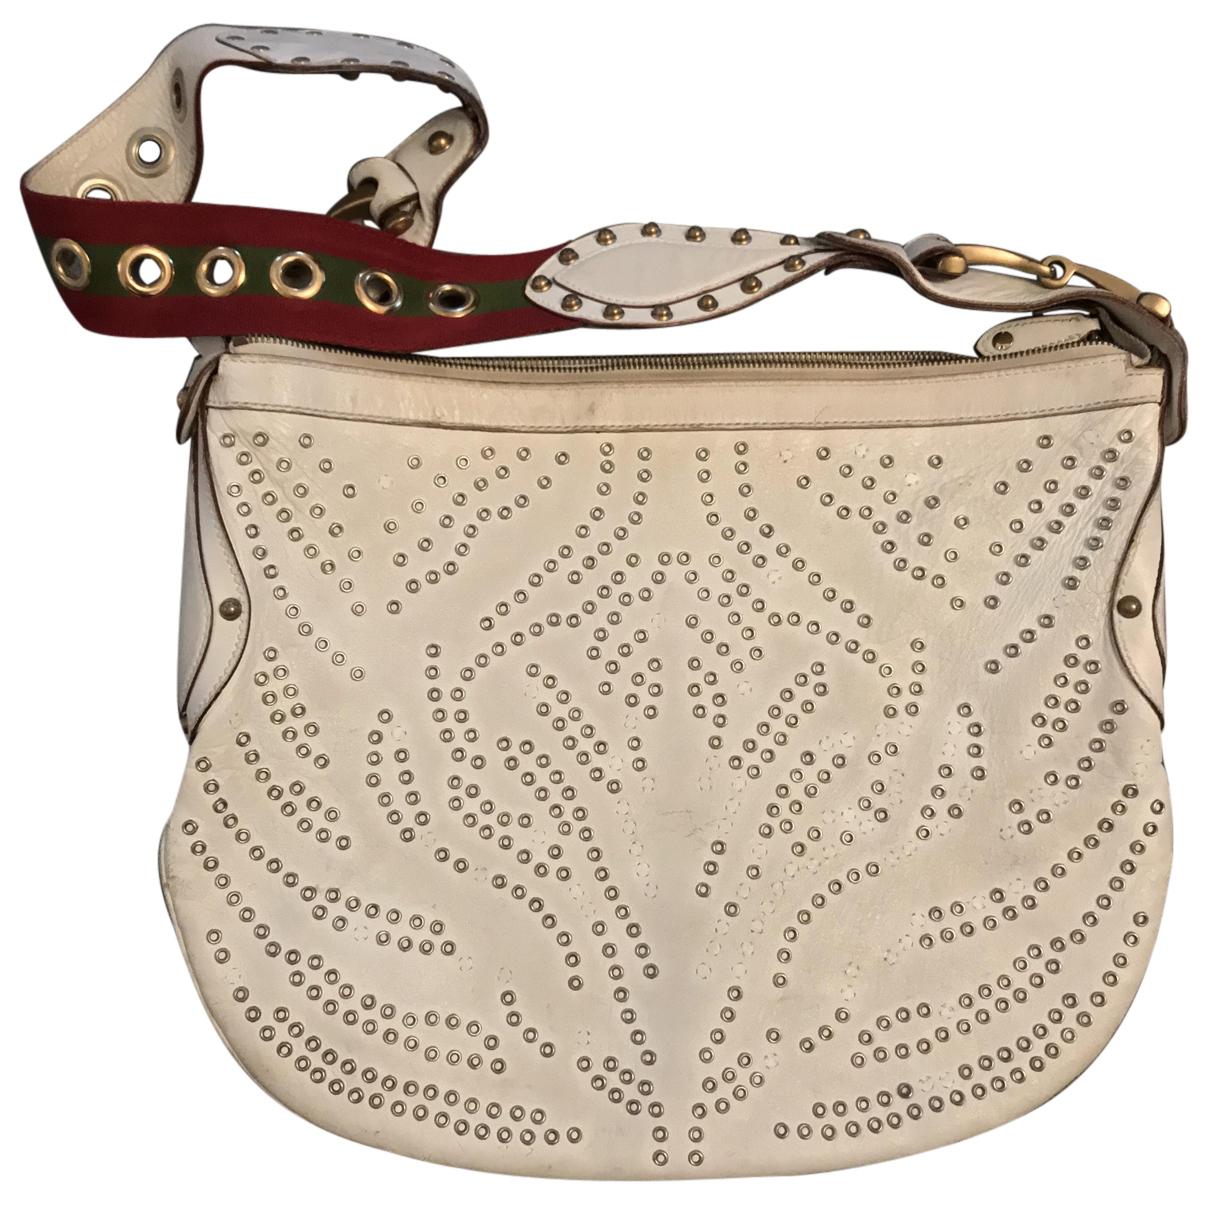 Gucci N White Leather handbag for Women N